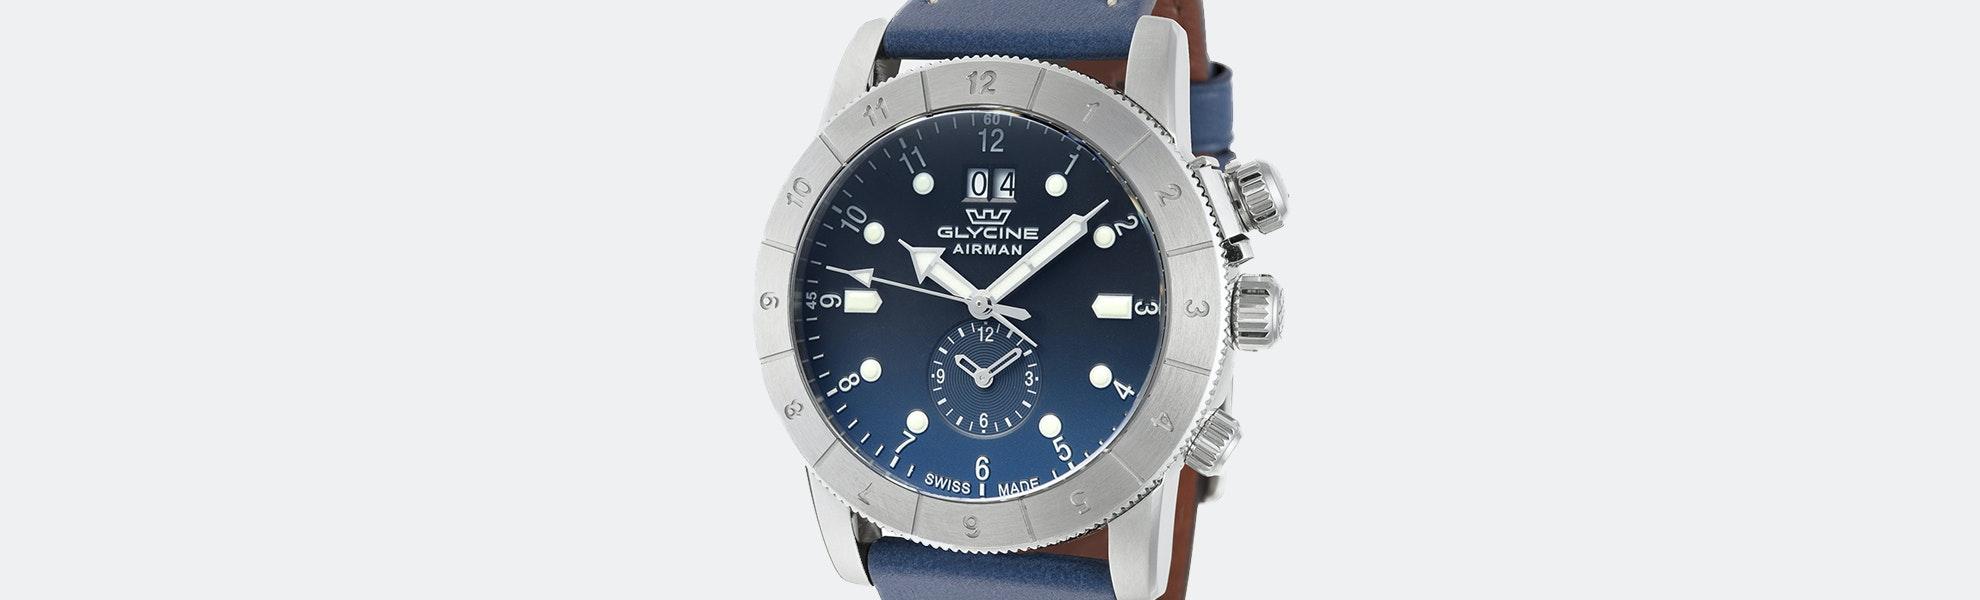 Glycine Airman Quartz Watch